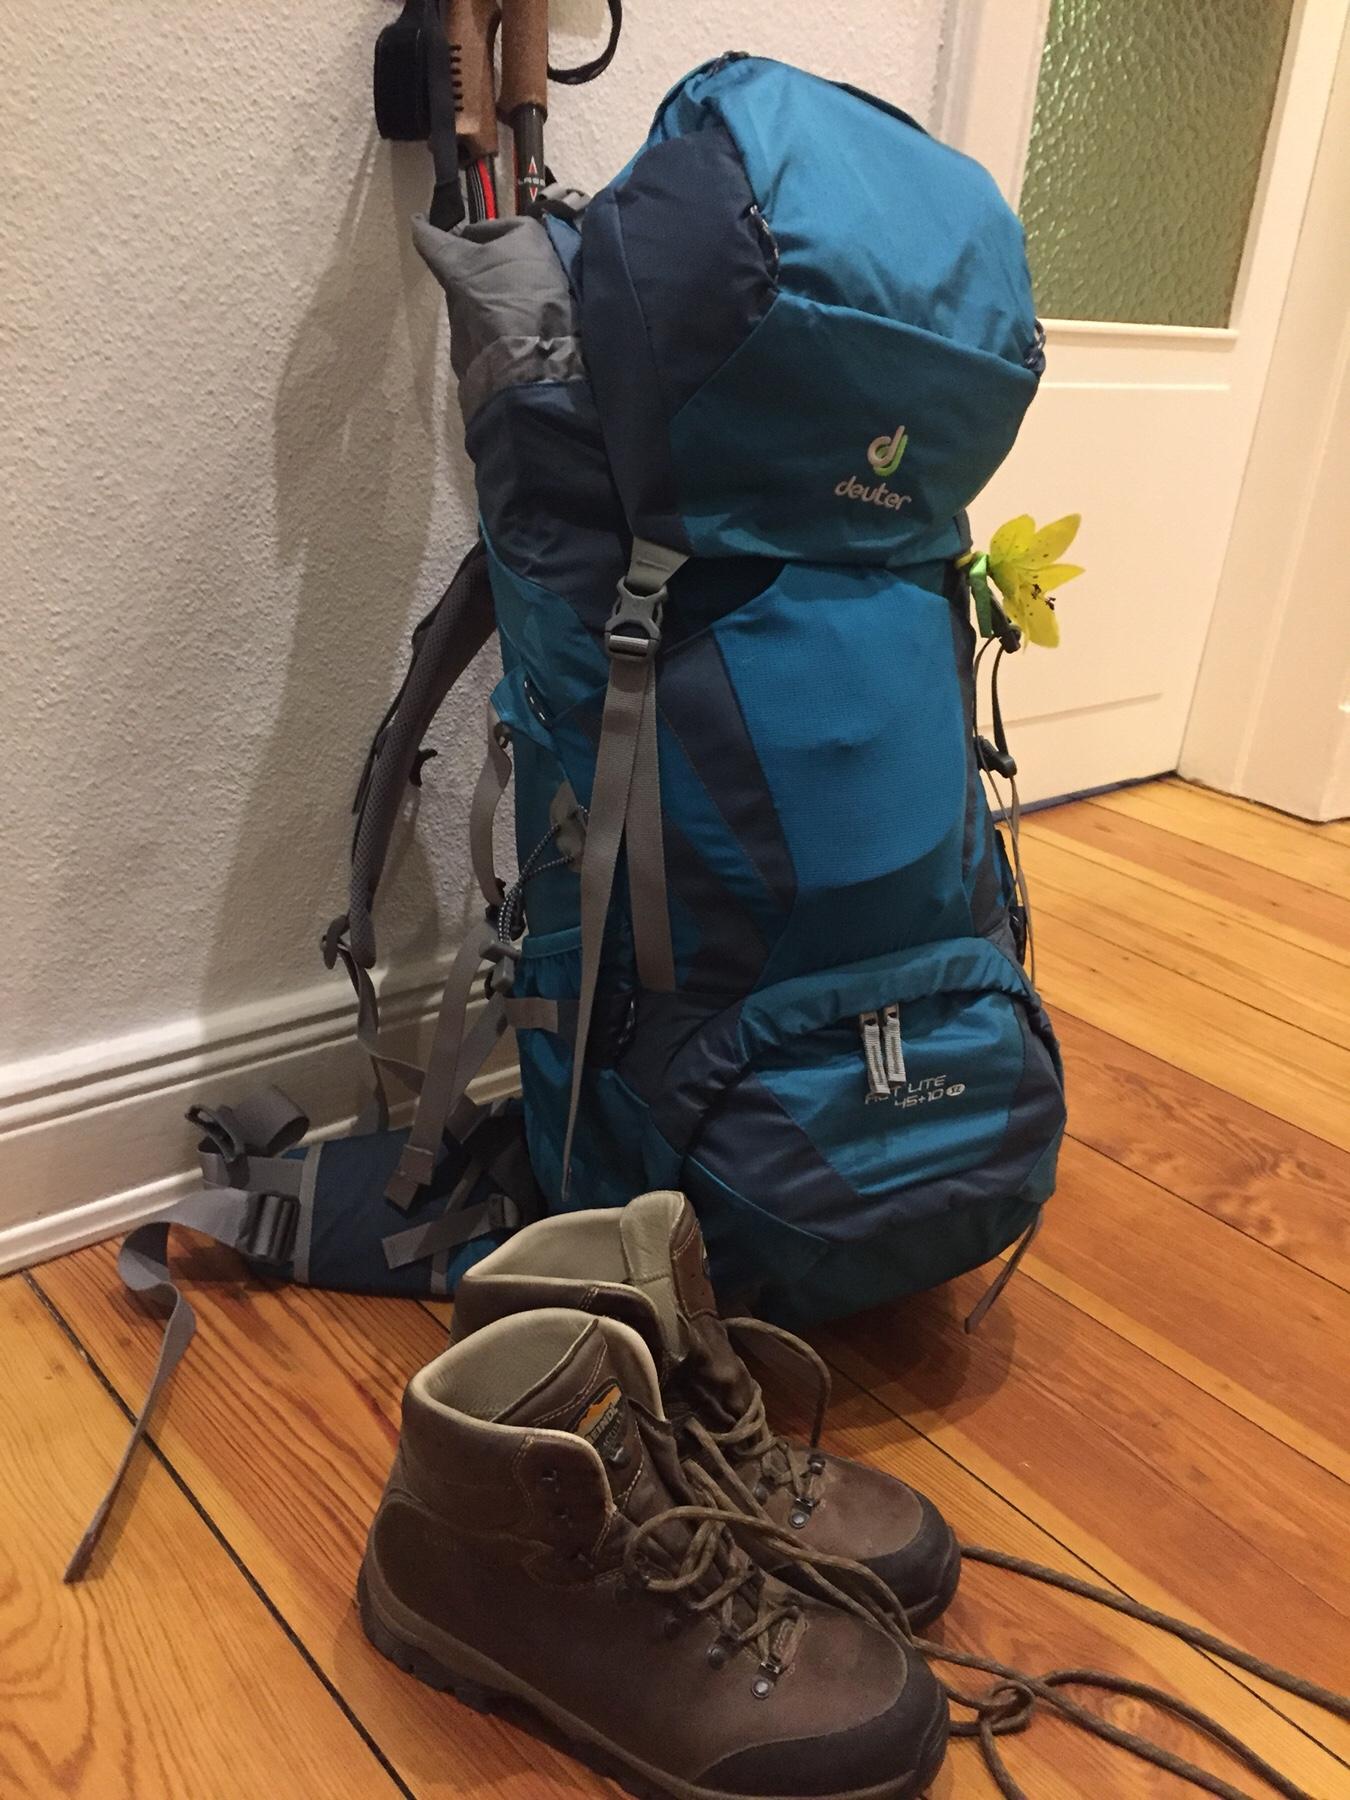 Vorbereitung Jakobsweg, mein gepackter Rucksack